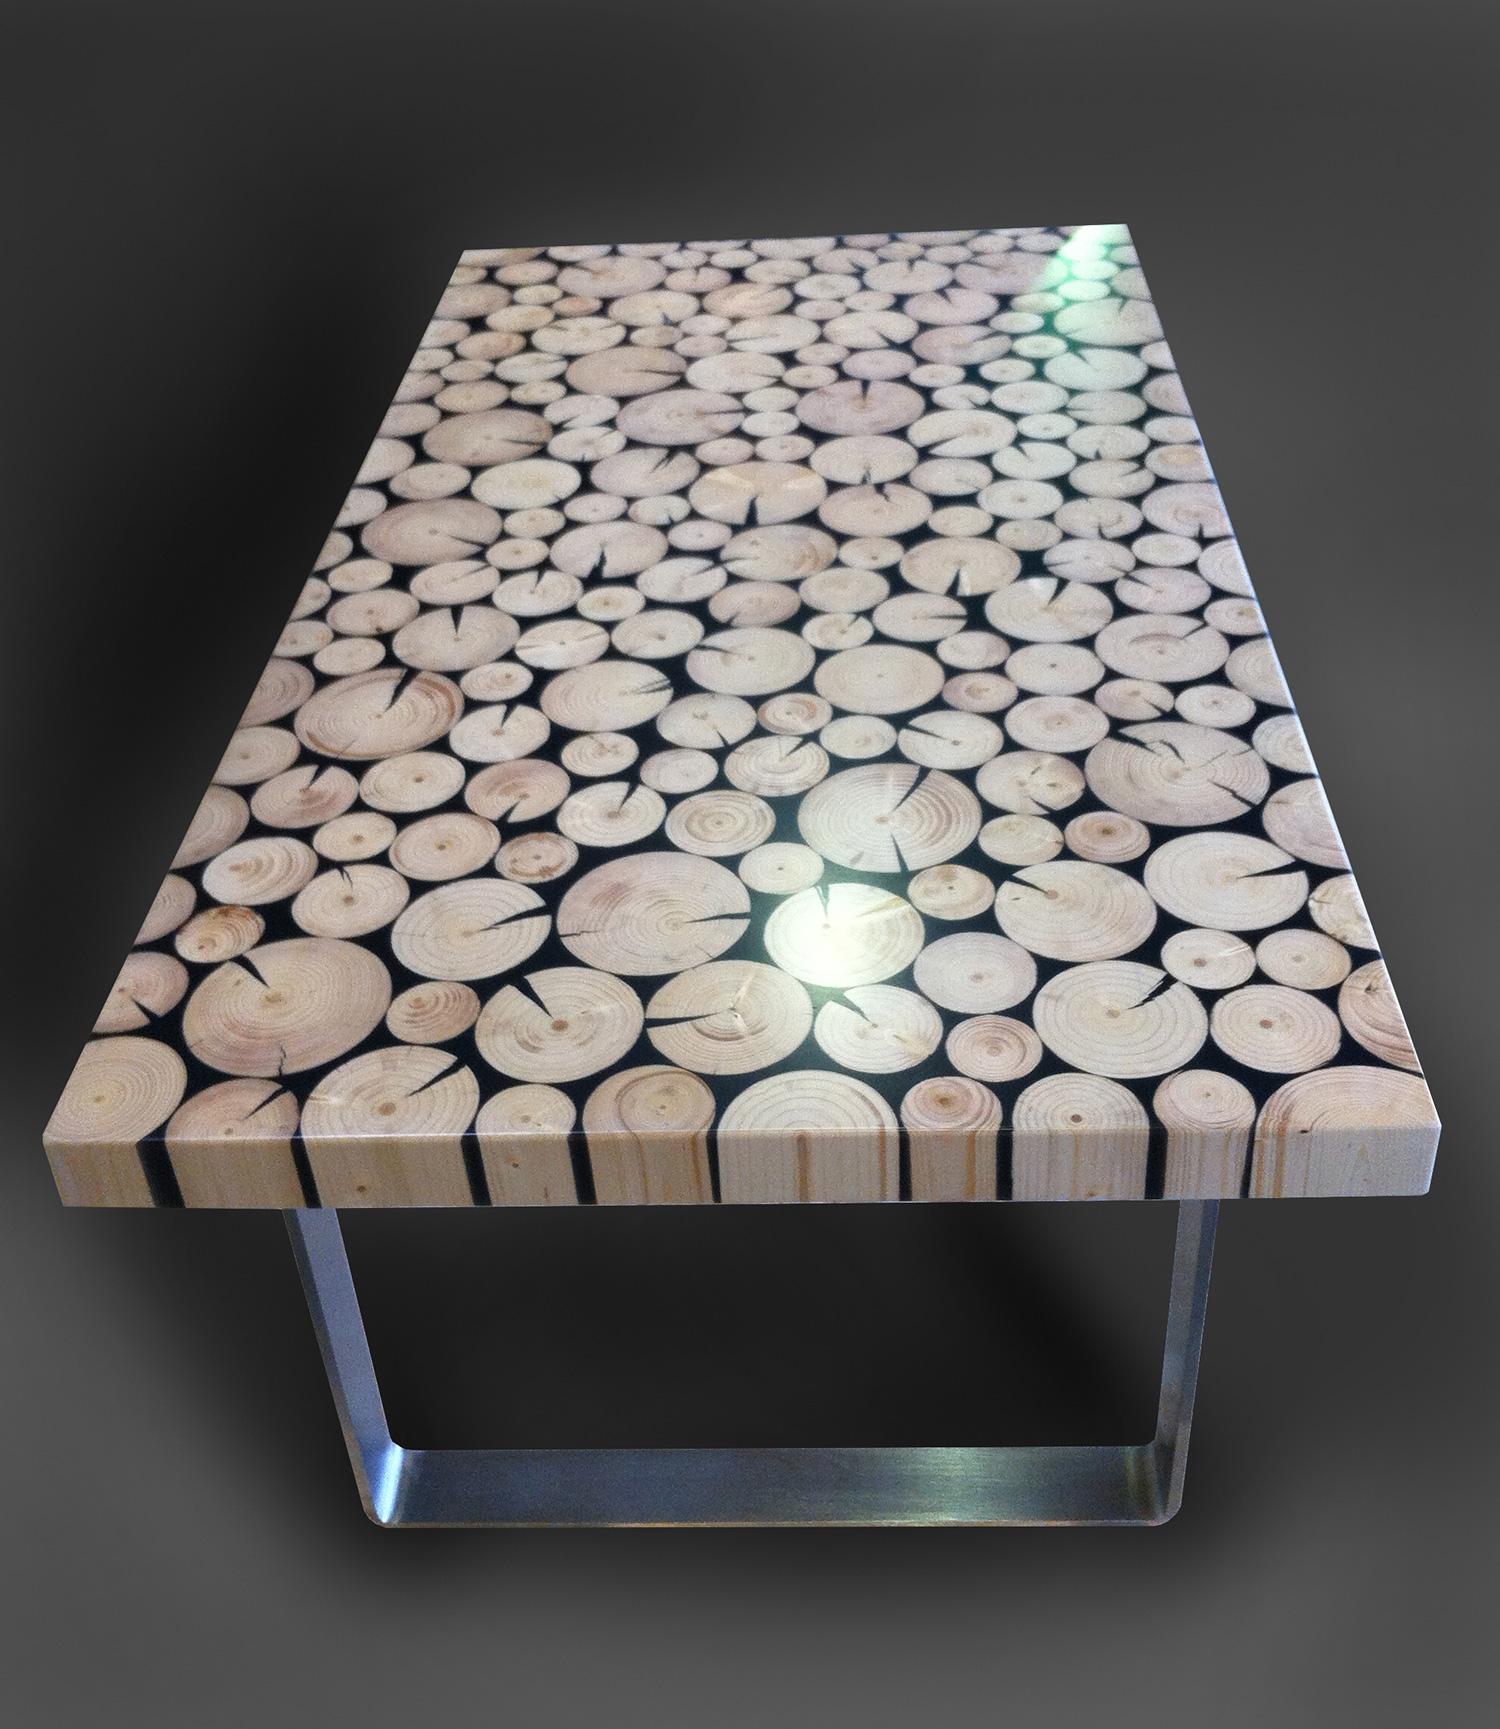 aniamo tavolo  Holzverbundsysteme  Holzdesign  Ziergitter